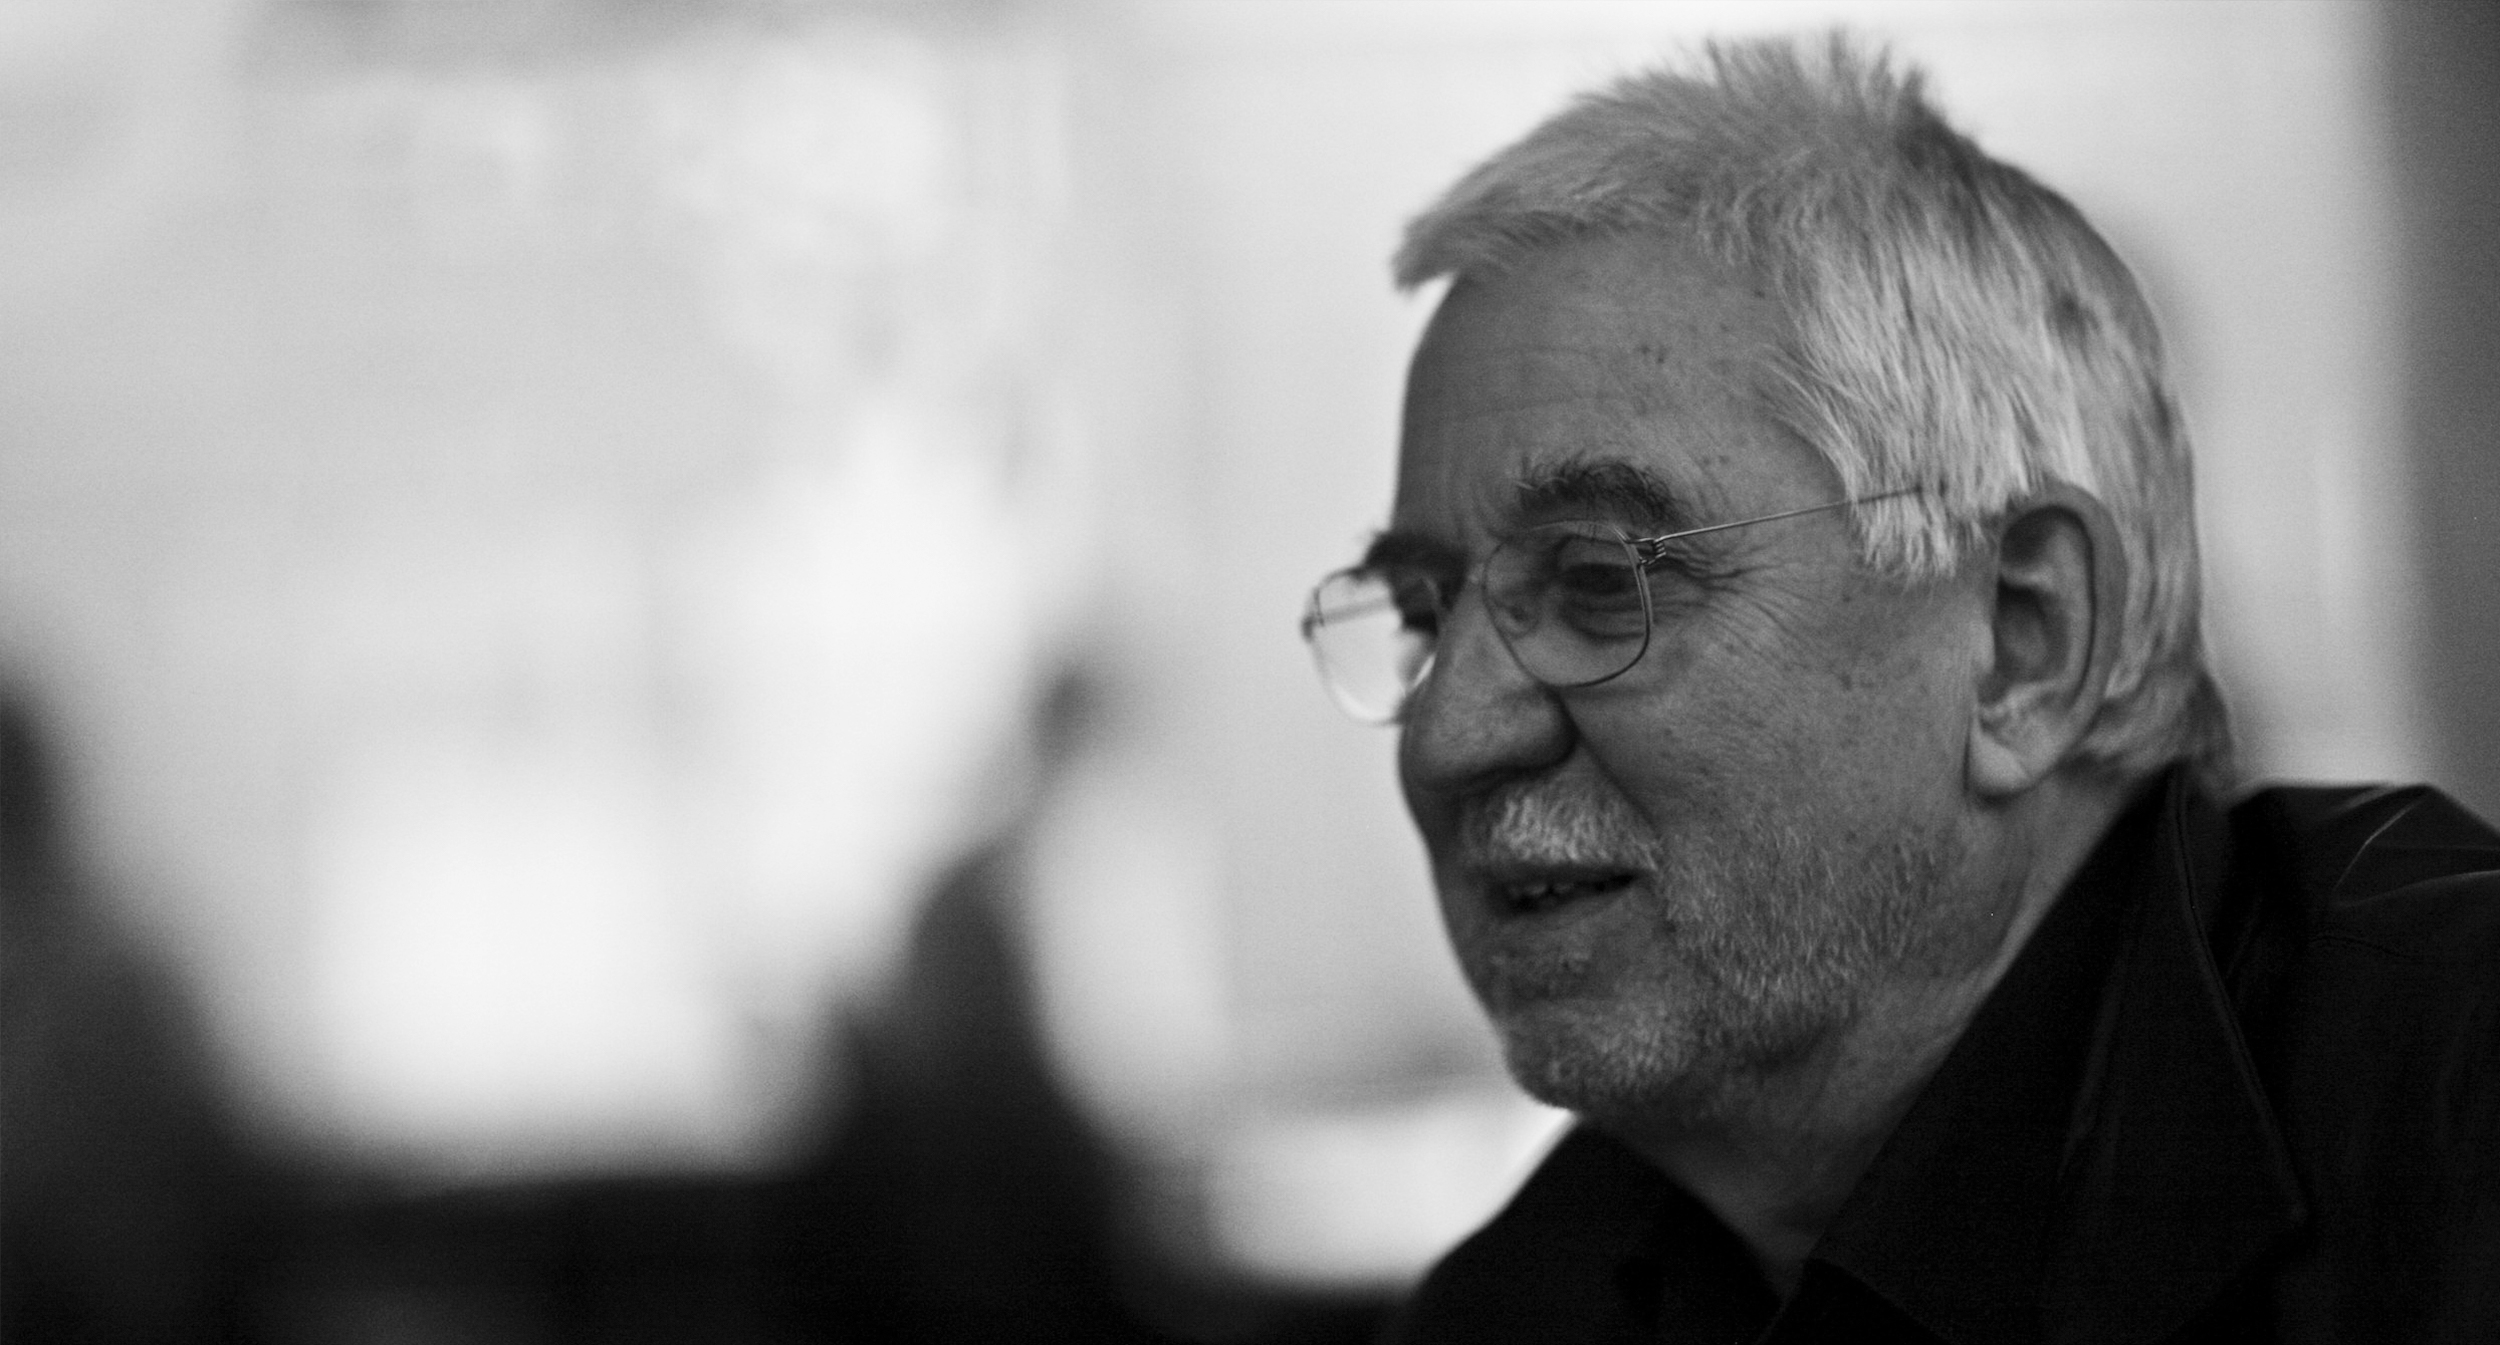 Poul Ove Jensen director bridges,architect maa +45 4032 7311                 email